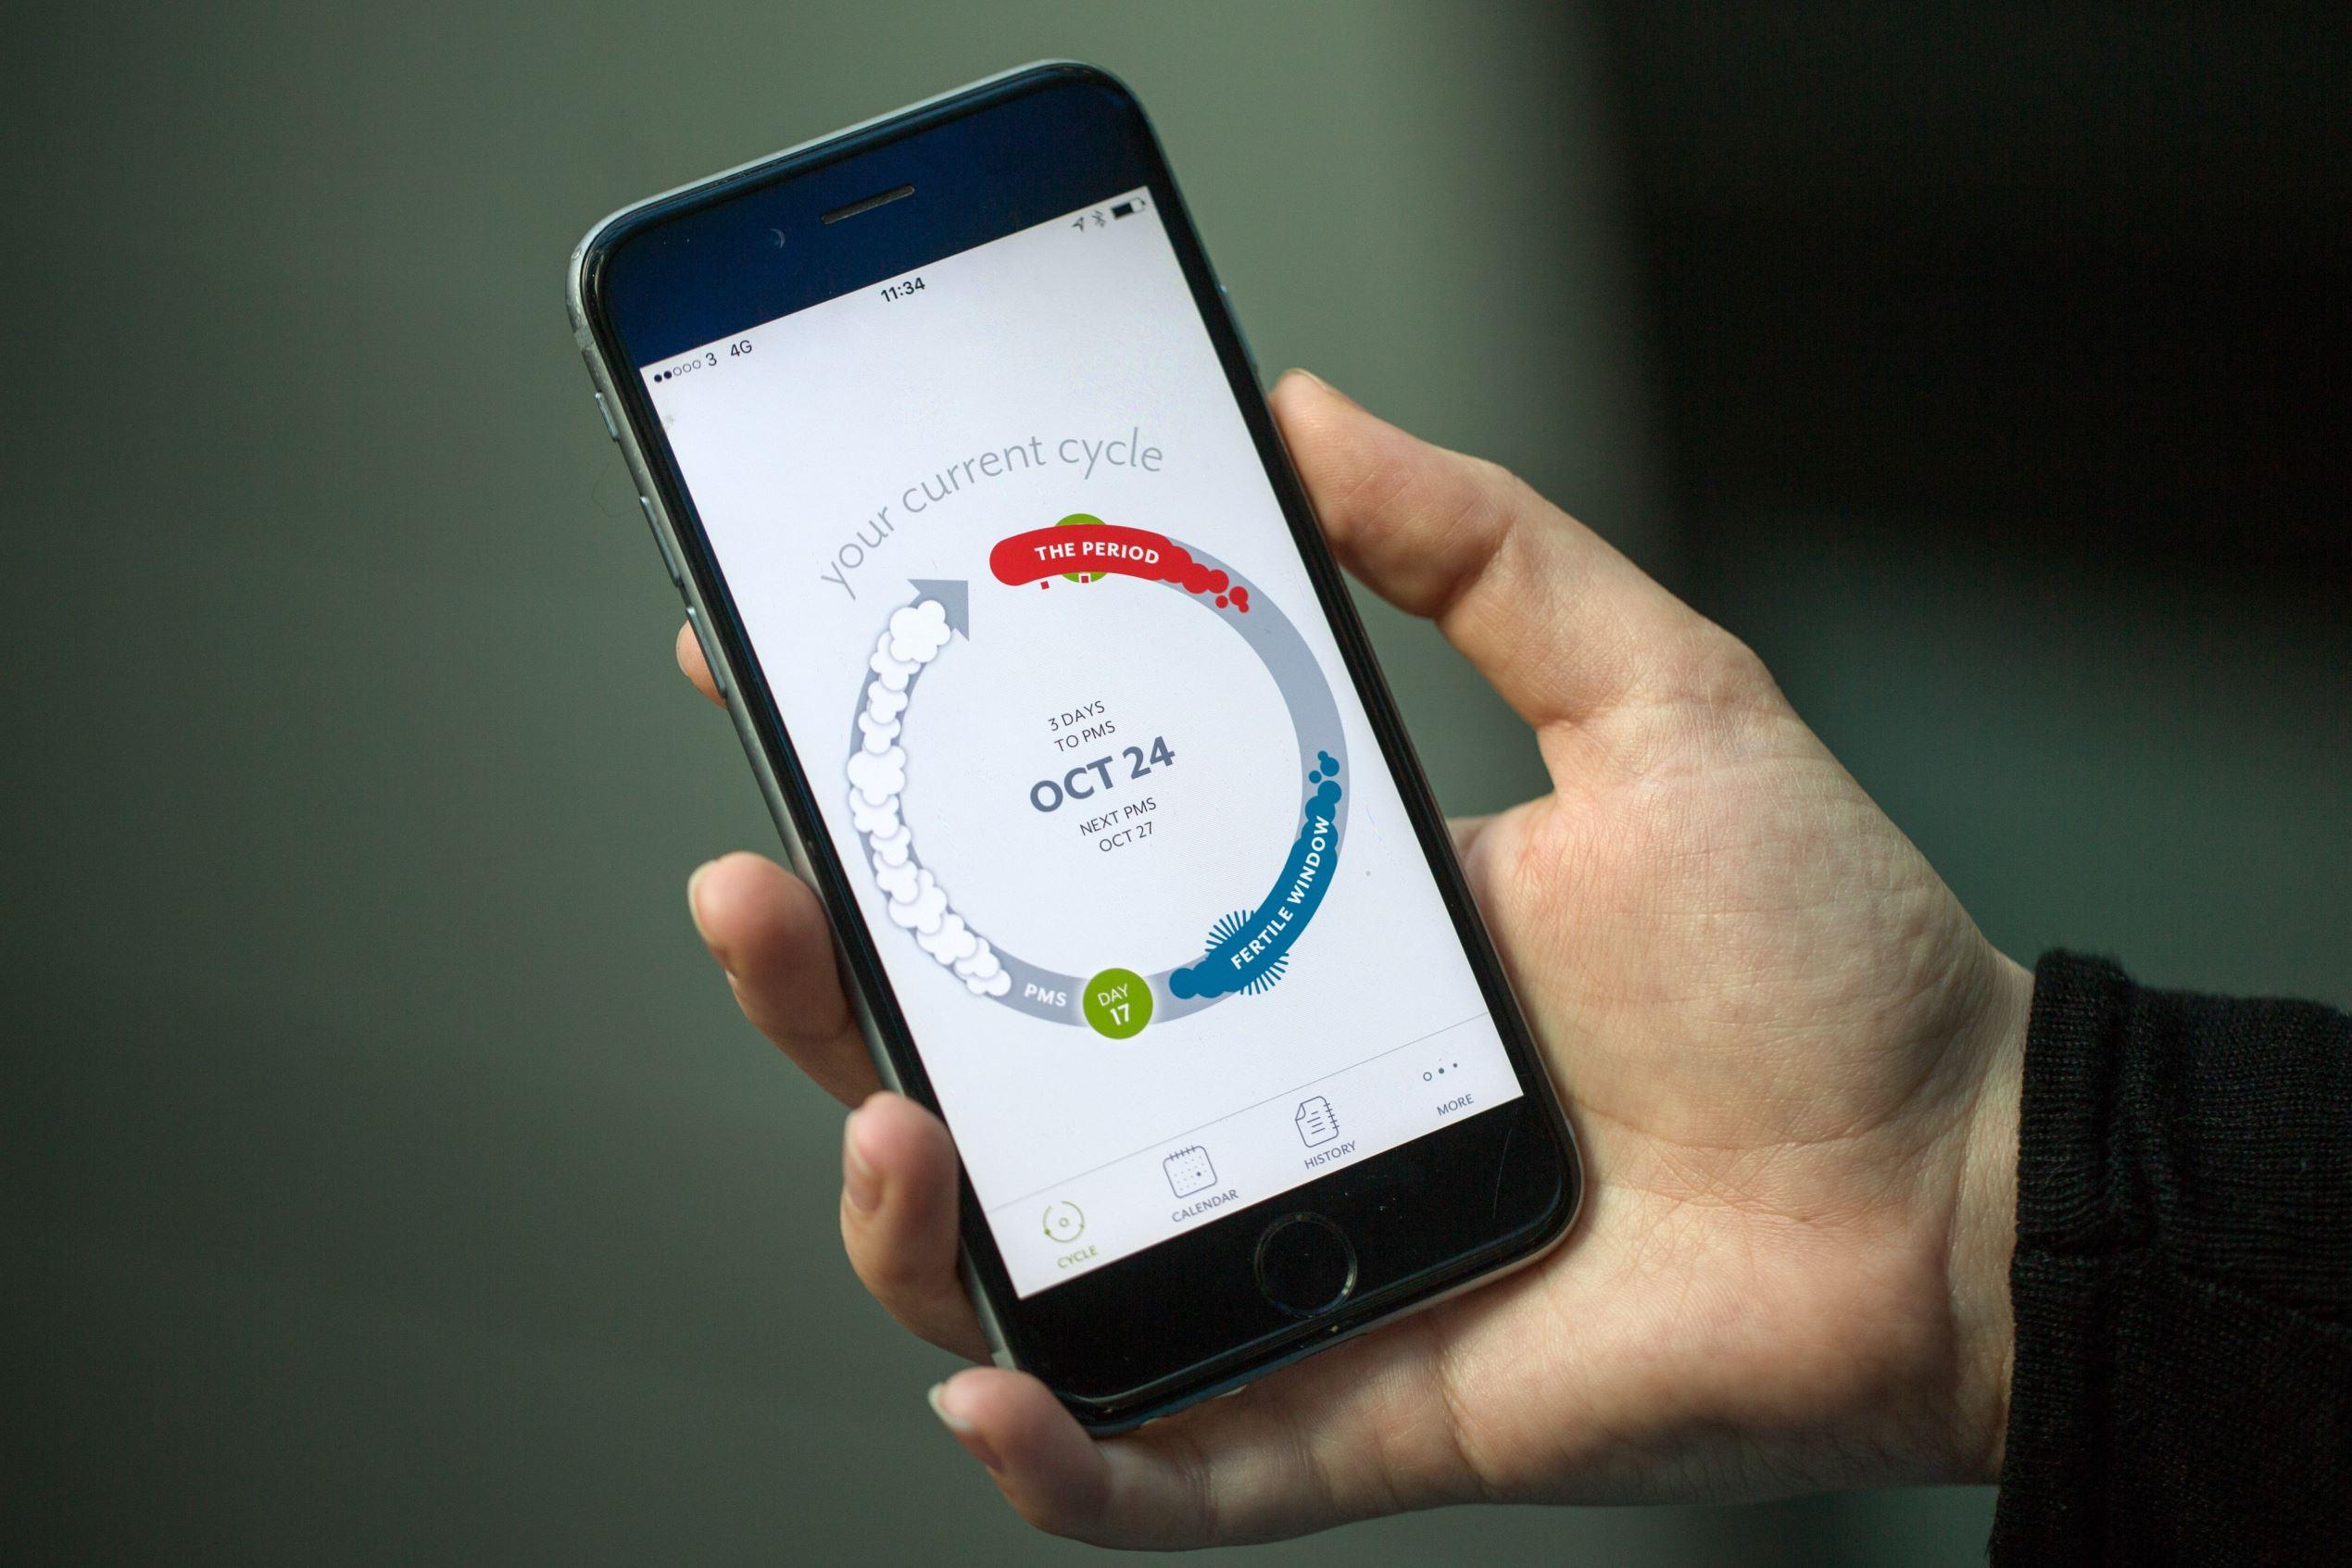 sesso sesso Apps per Windows Phone